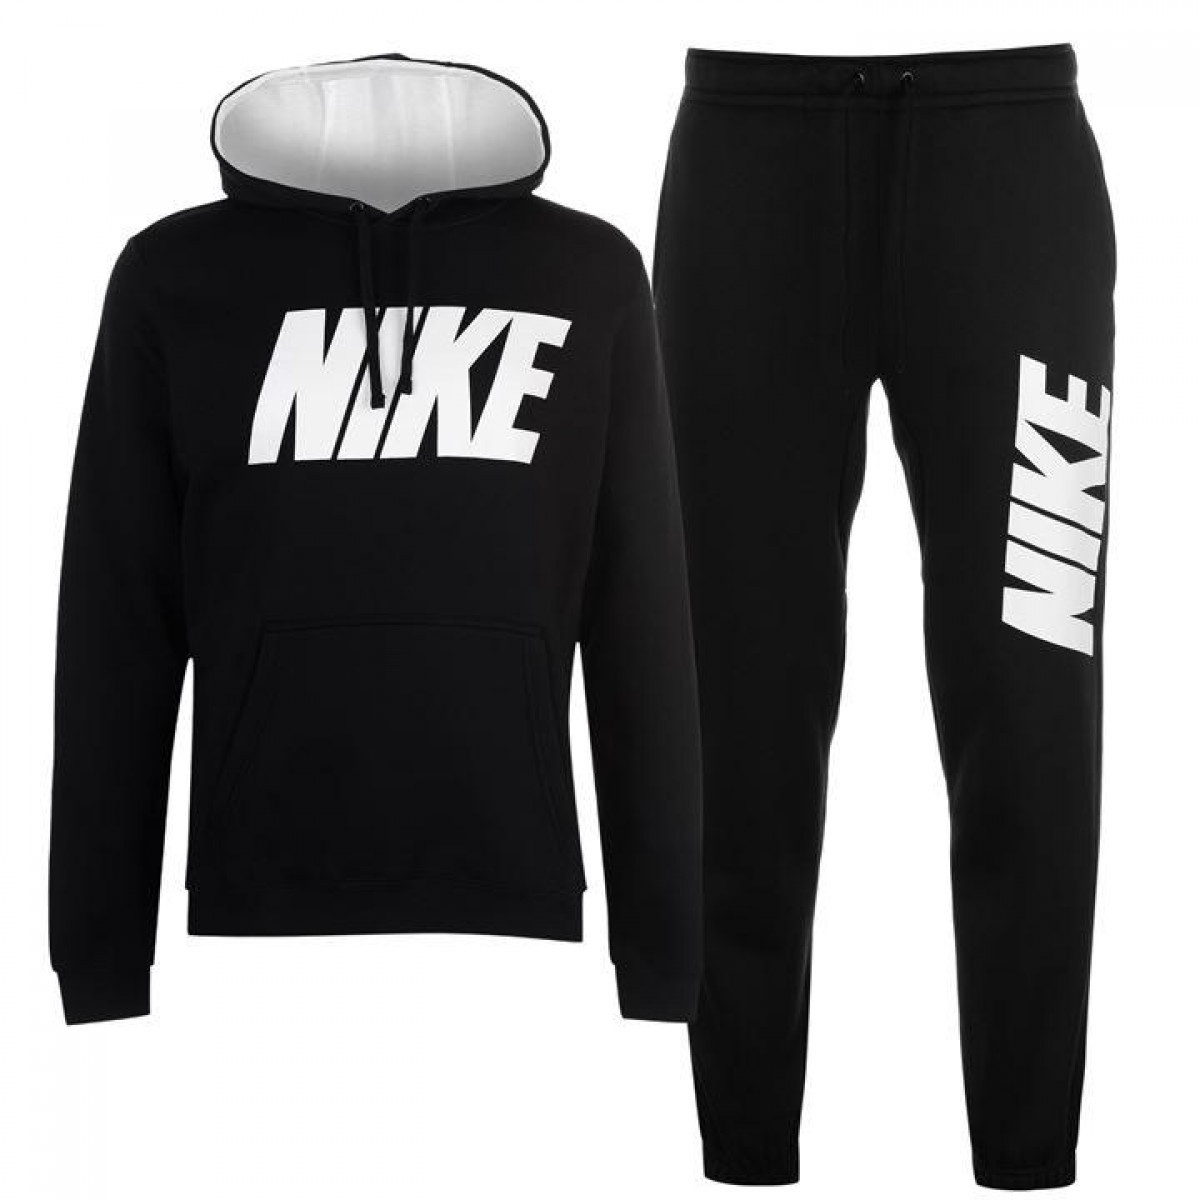 Спортивный костюм Nike JDI Fleece Black White - Оригинал - FAIR -  оригинальная одежда и 4b97a4aead4